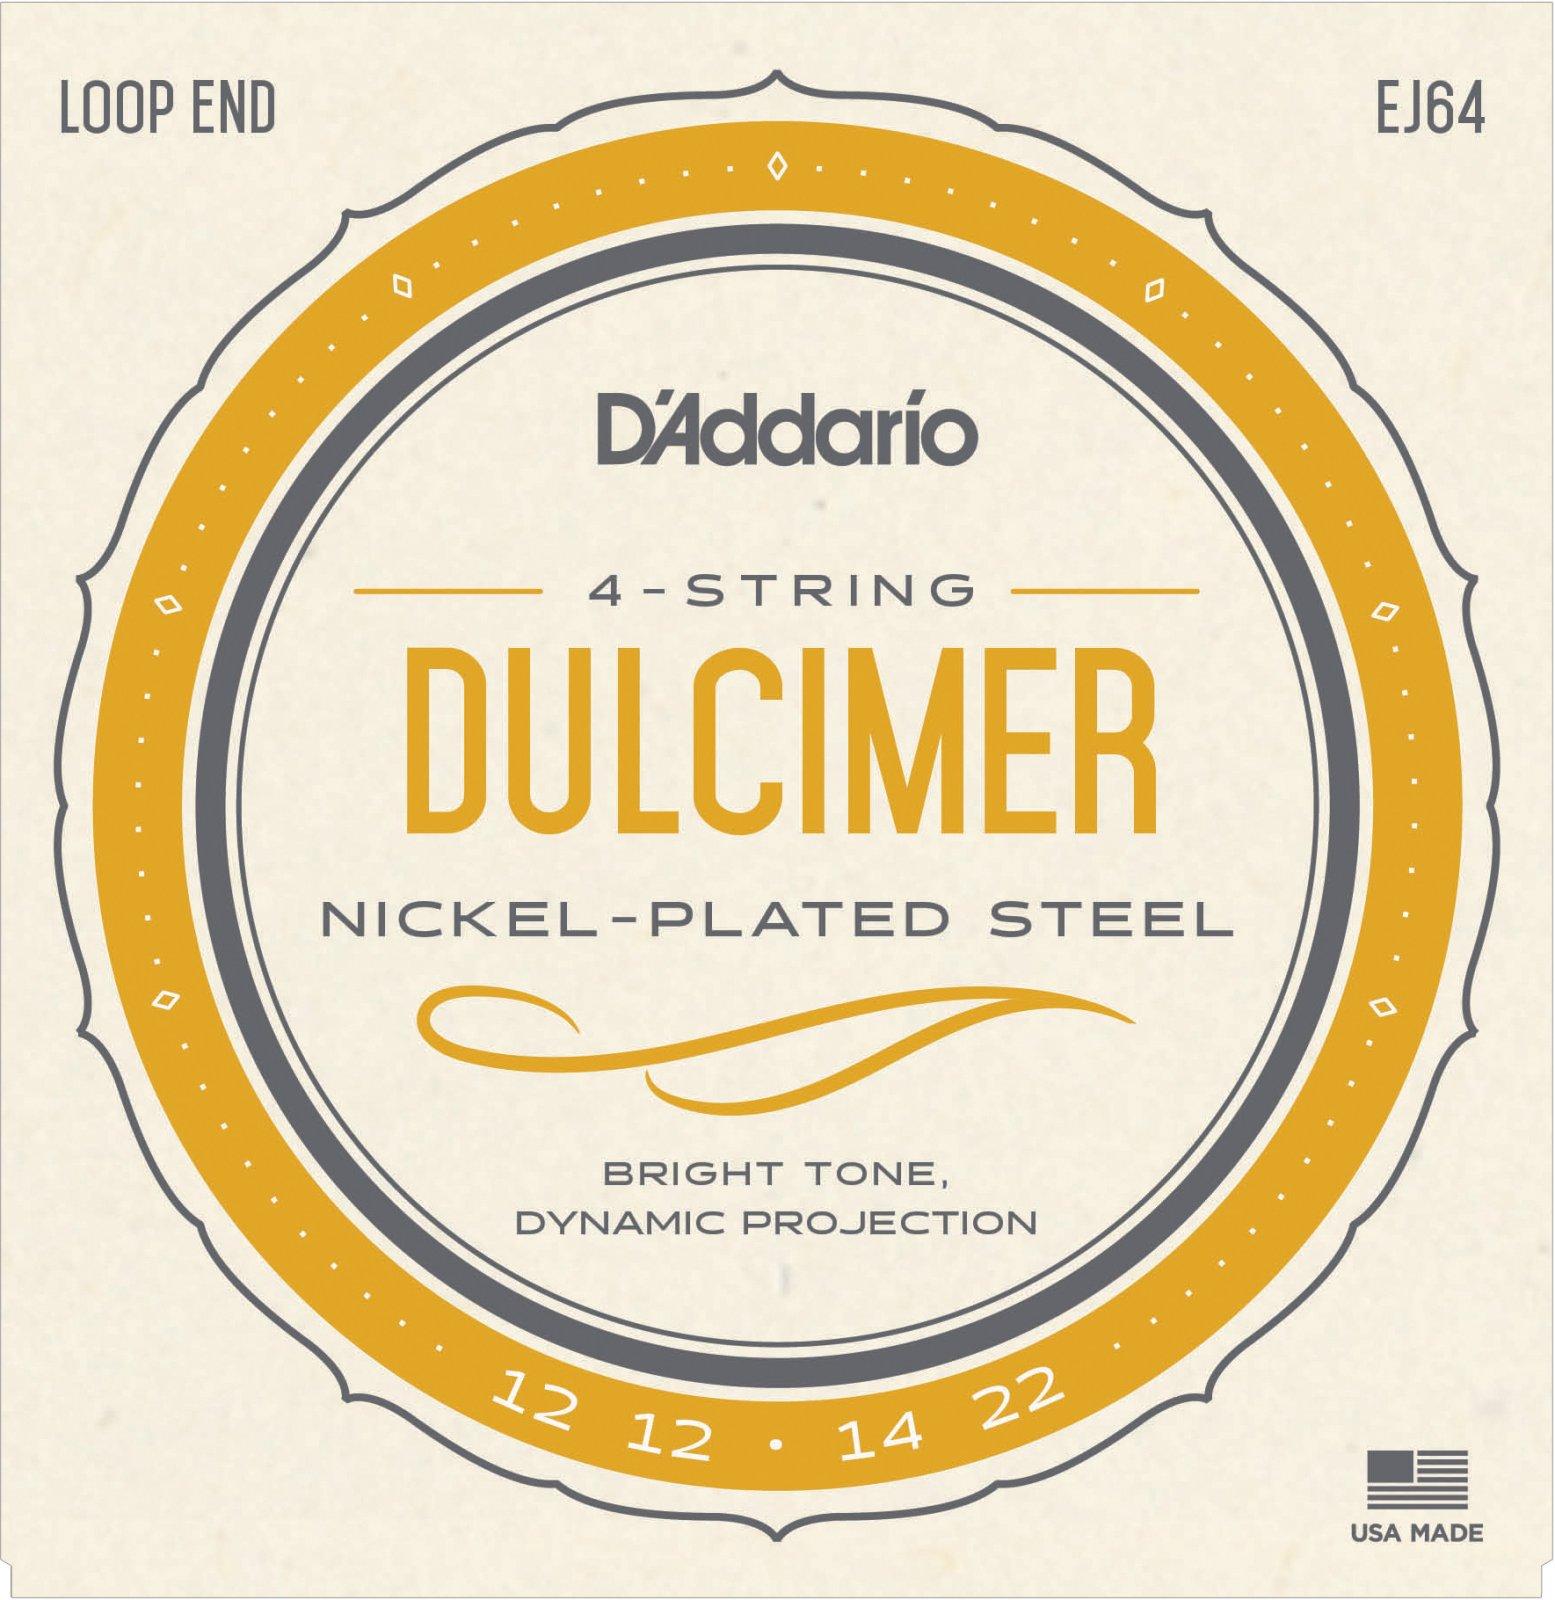 D'Addario Nickel EJ64 Dulcimer Strings, 4-String, 12-22